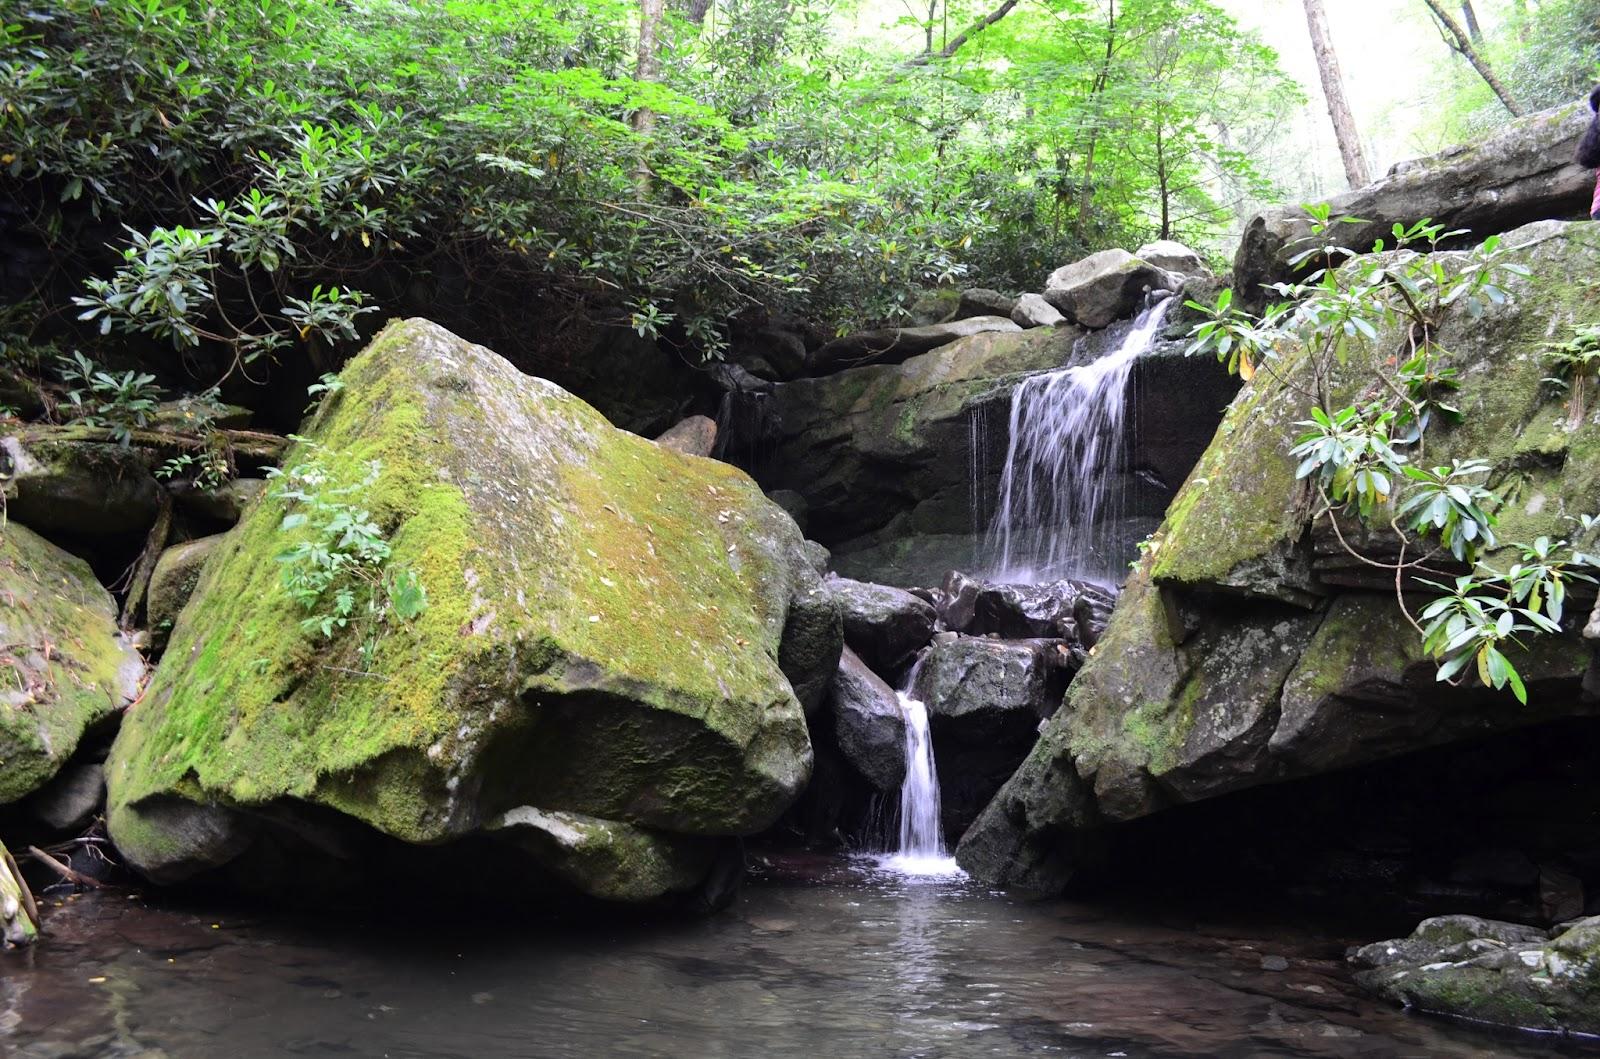 National Park Traveler ...: Trillium Gap Trail - Grotto Falls